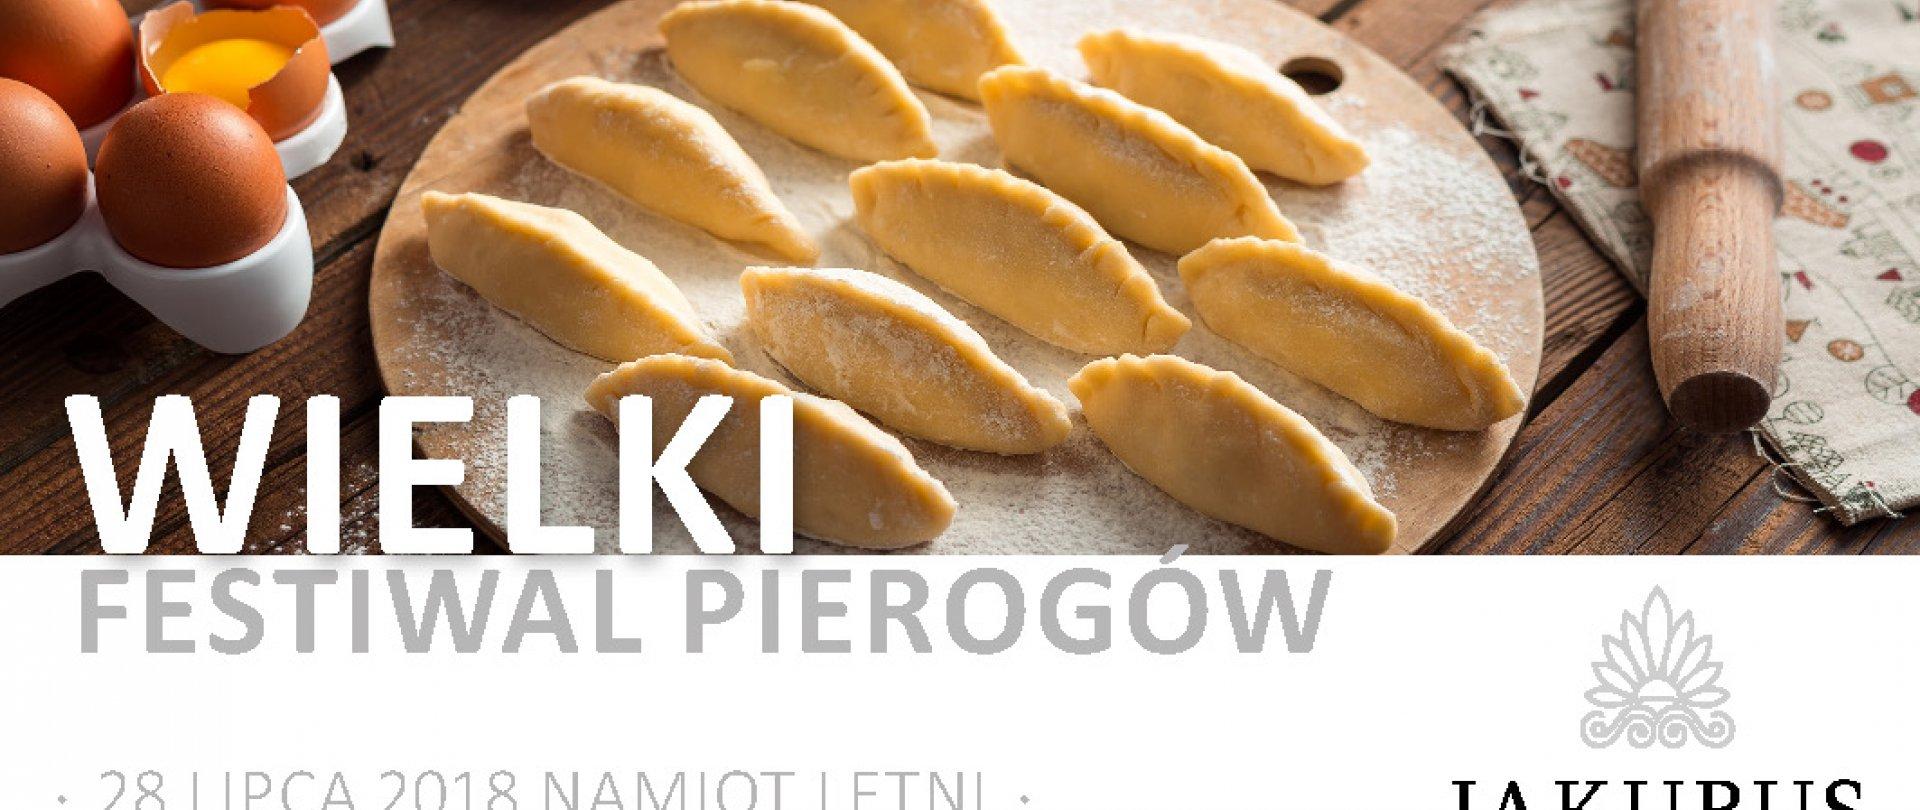 Wielki Festiwal Pierogów 28.07